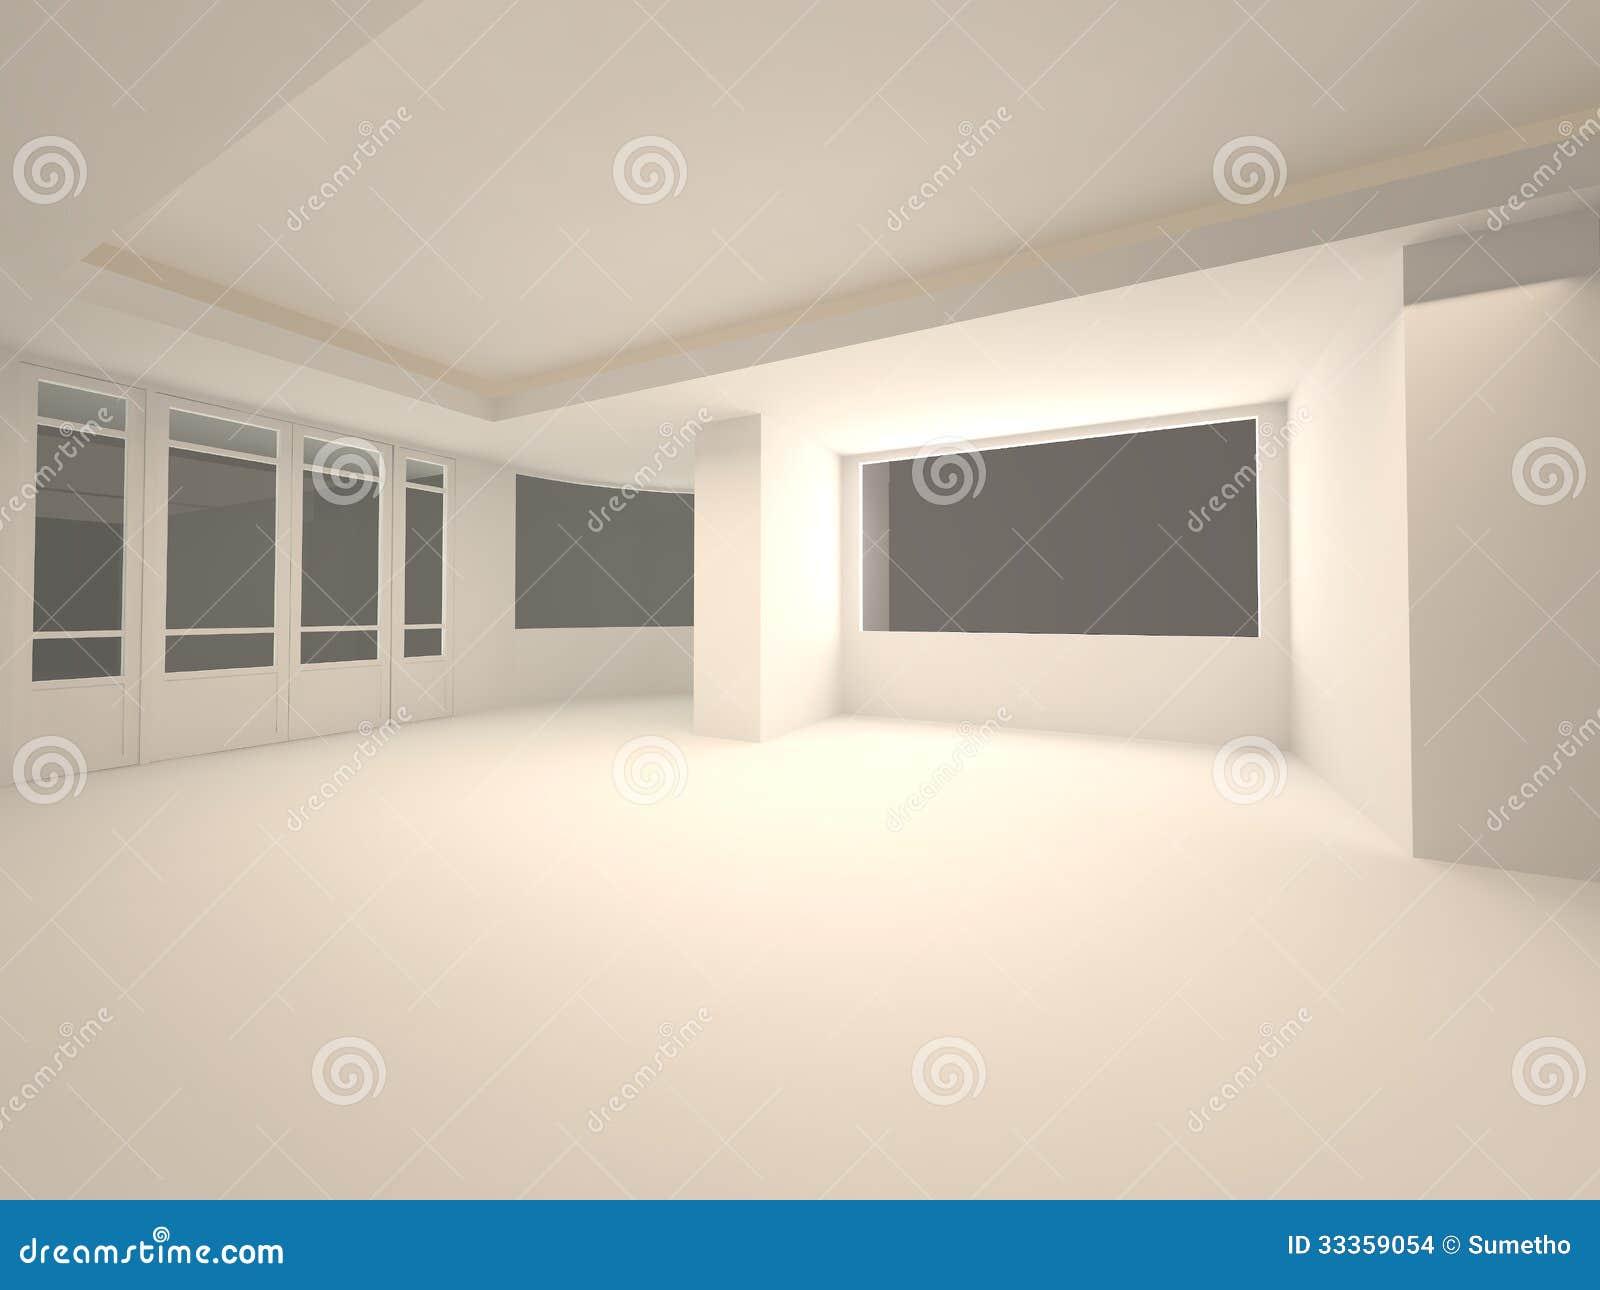 empty interior scene with door stock photo - image: 48772674